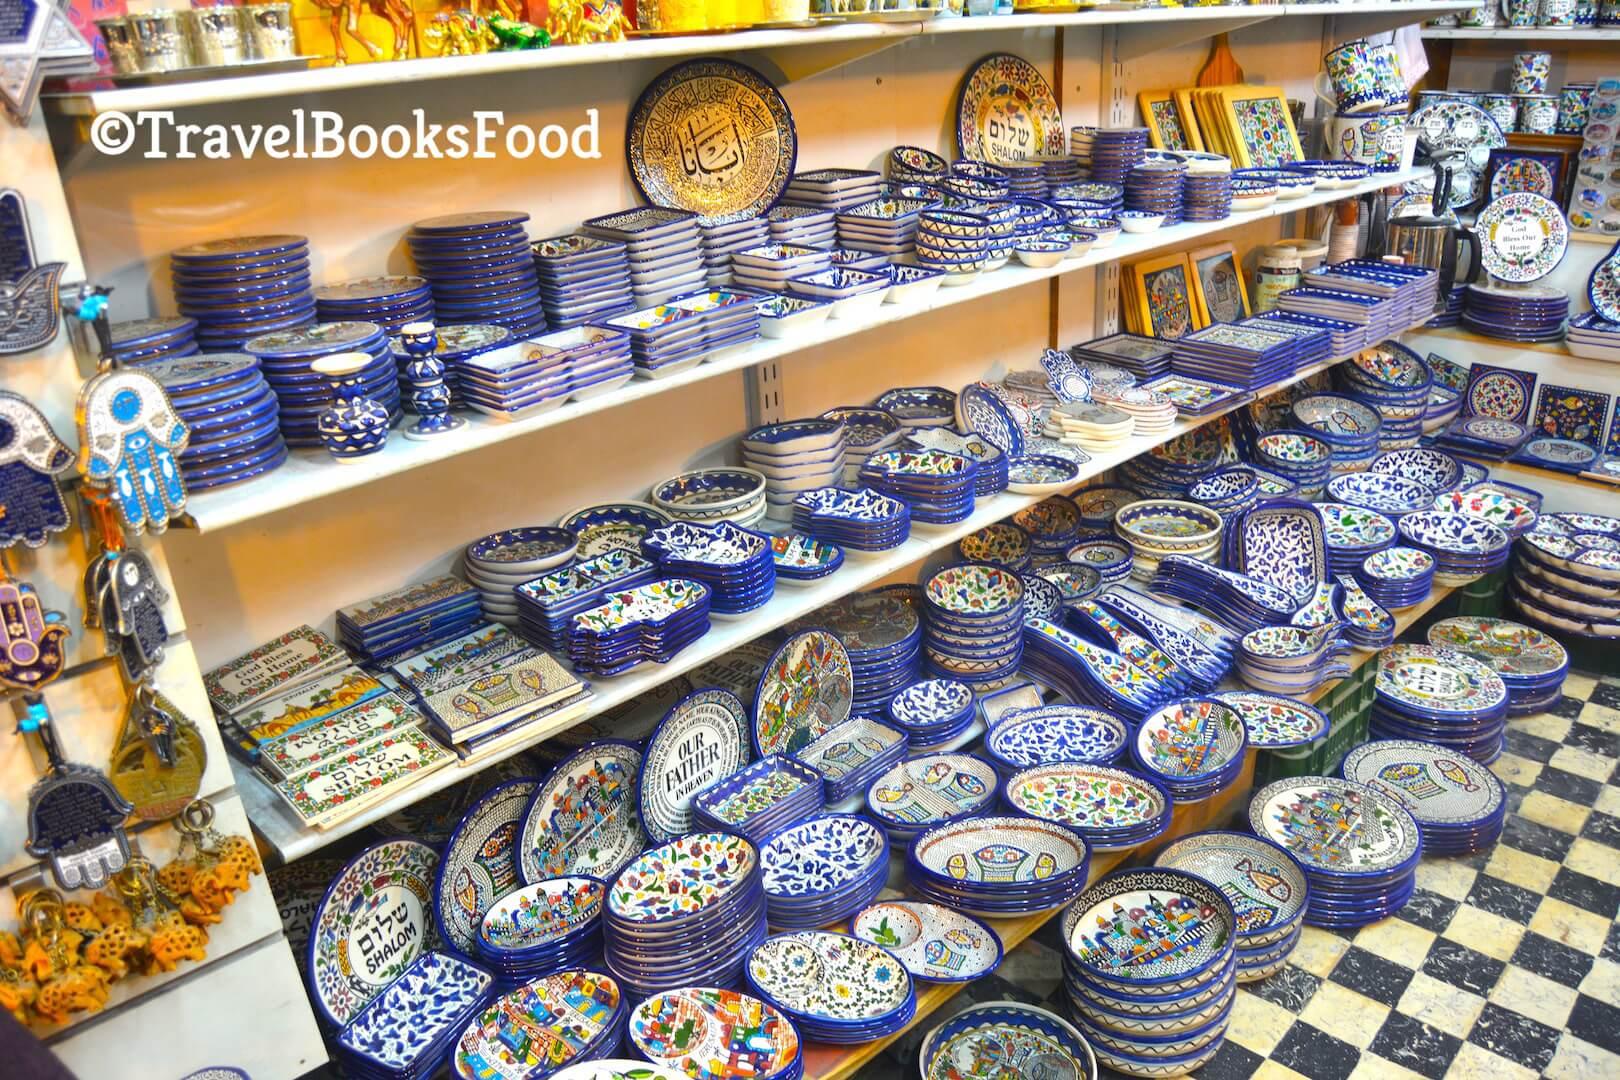 A shop in Jerusalem selling souvenirs and Armenian crockery